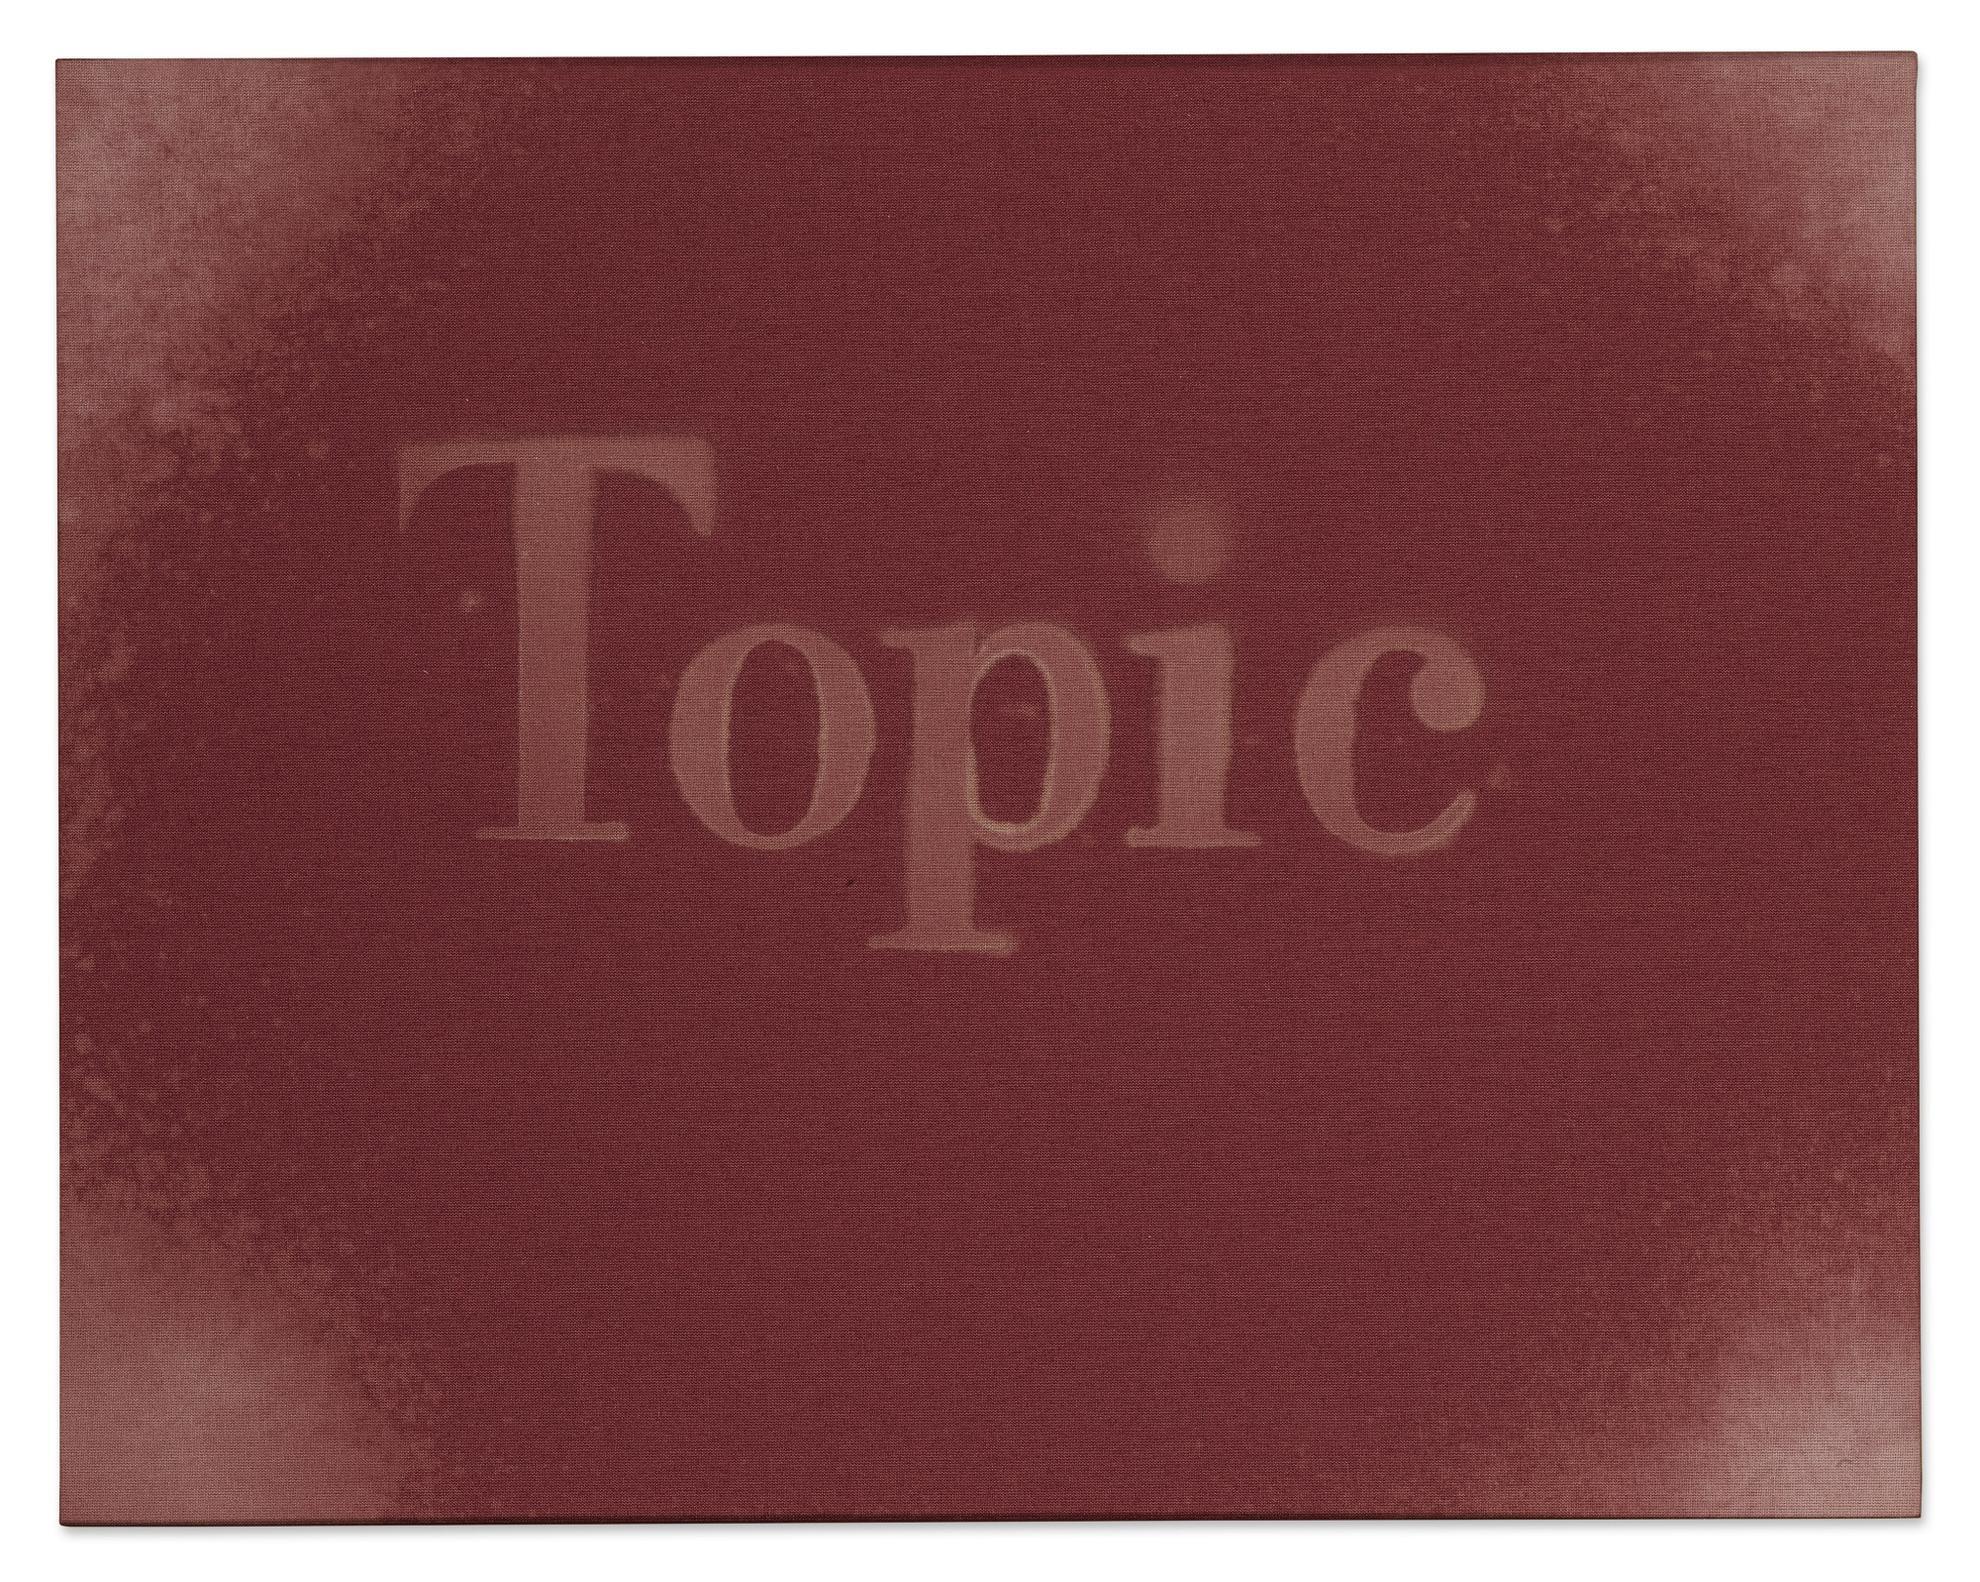 Ed Ruscha-Topic-2012